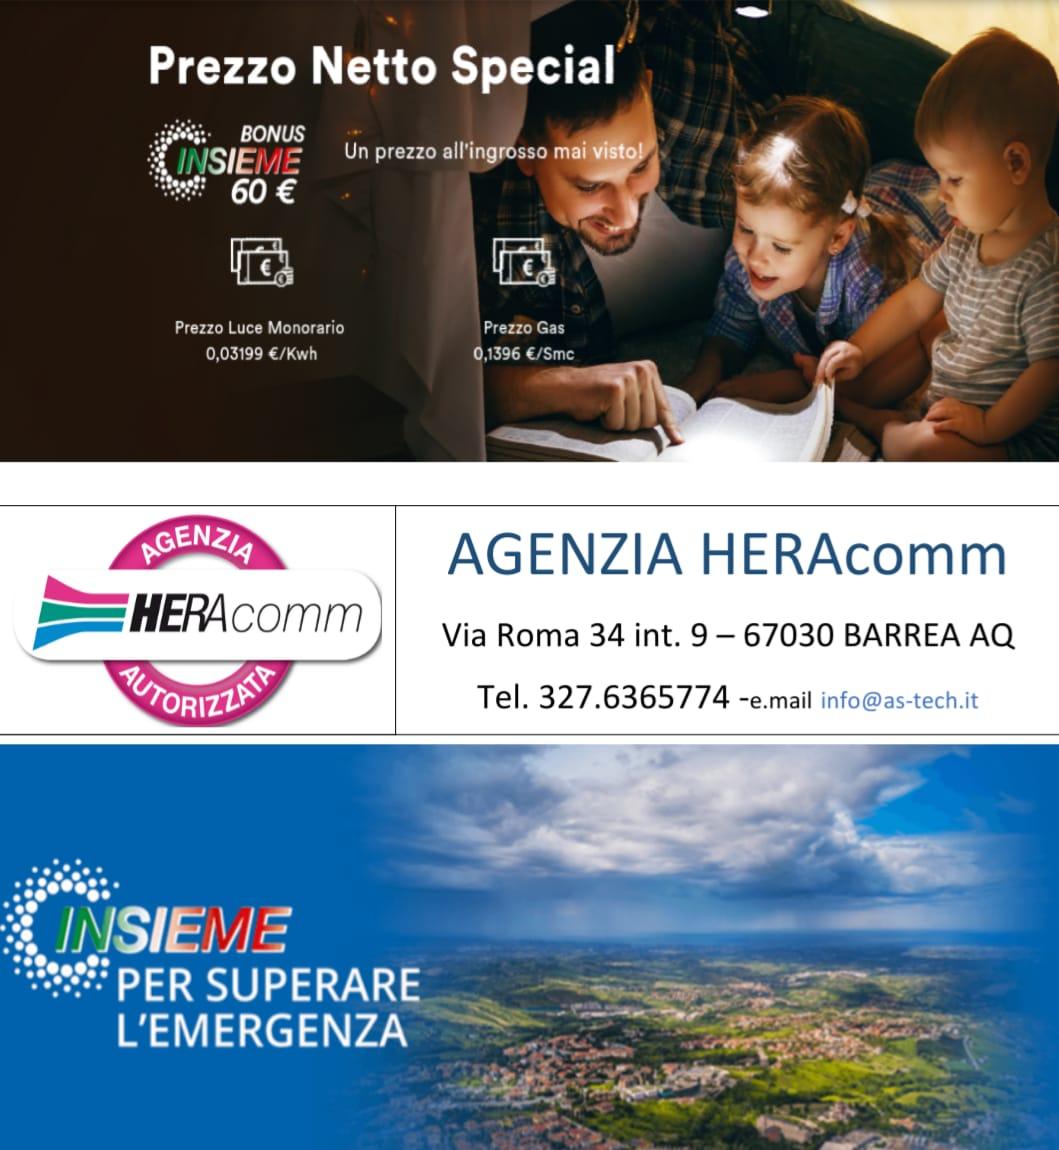 Hera offerta luce e gas - Hera Comm